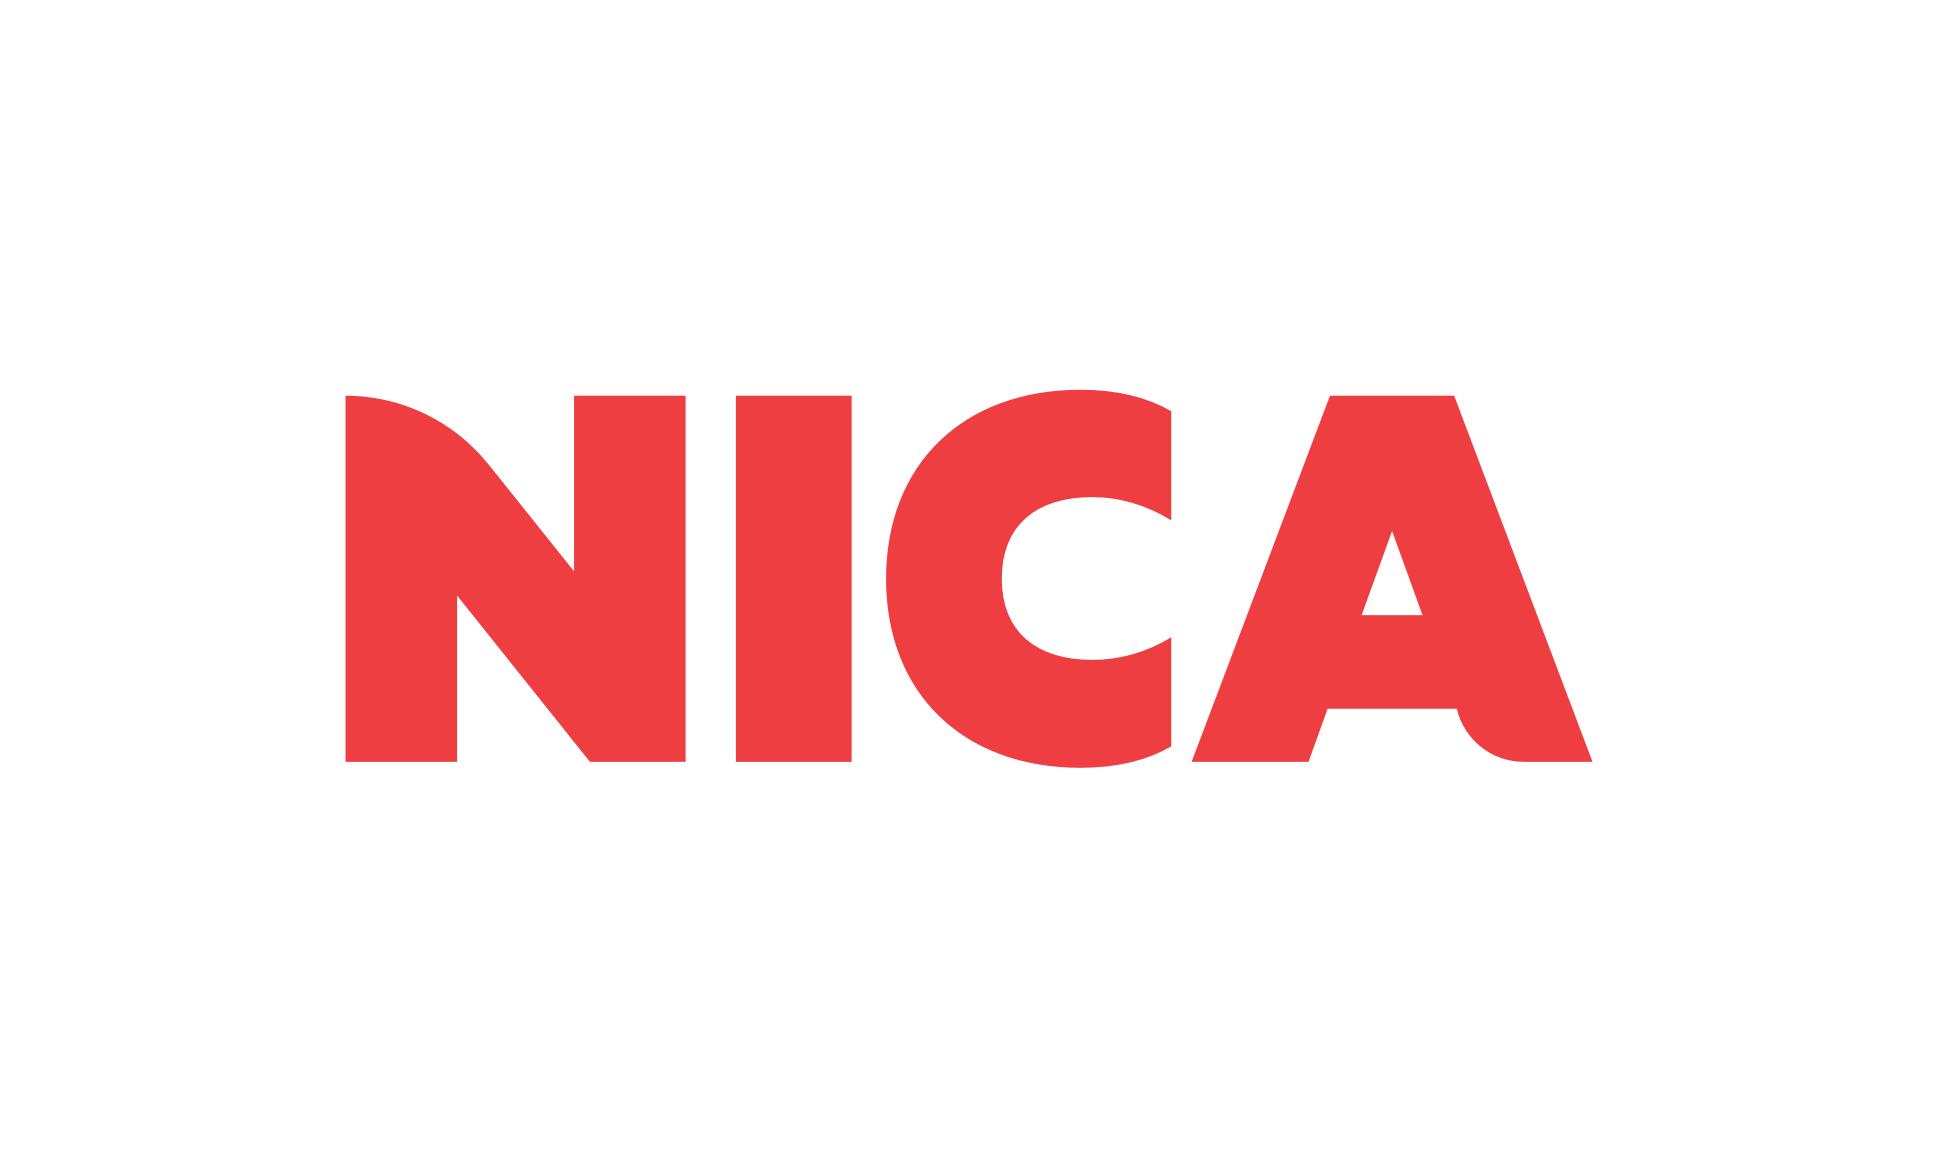 nica-logo-8@2x.png